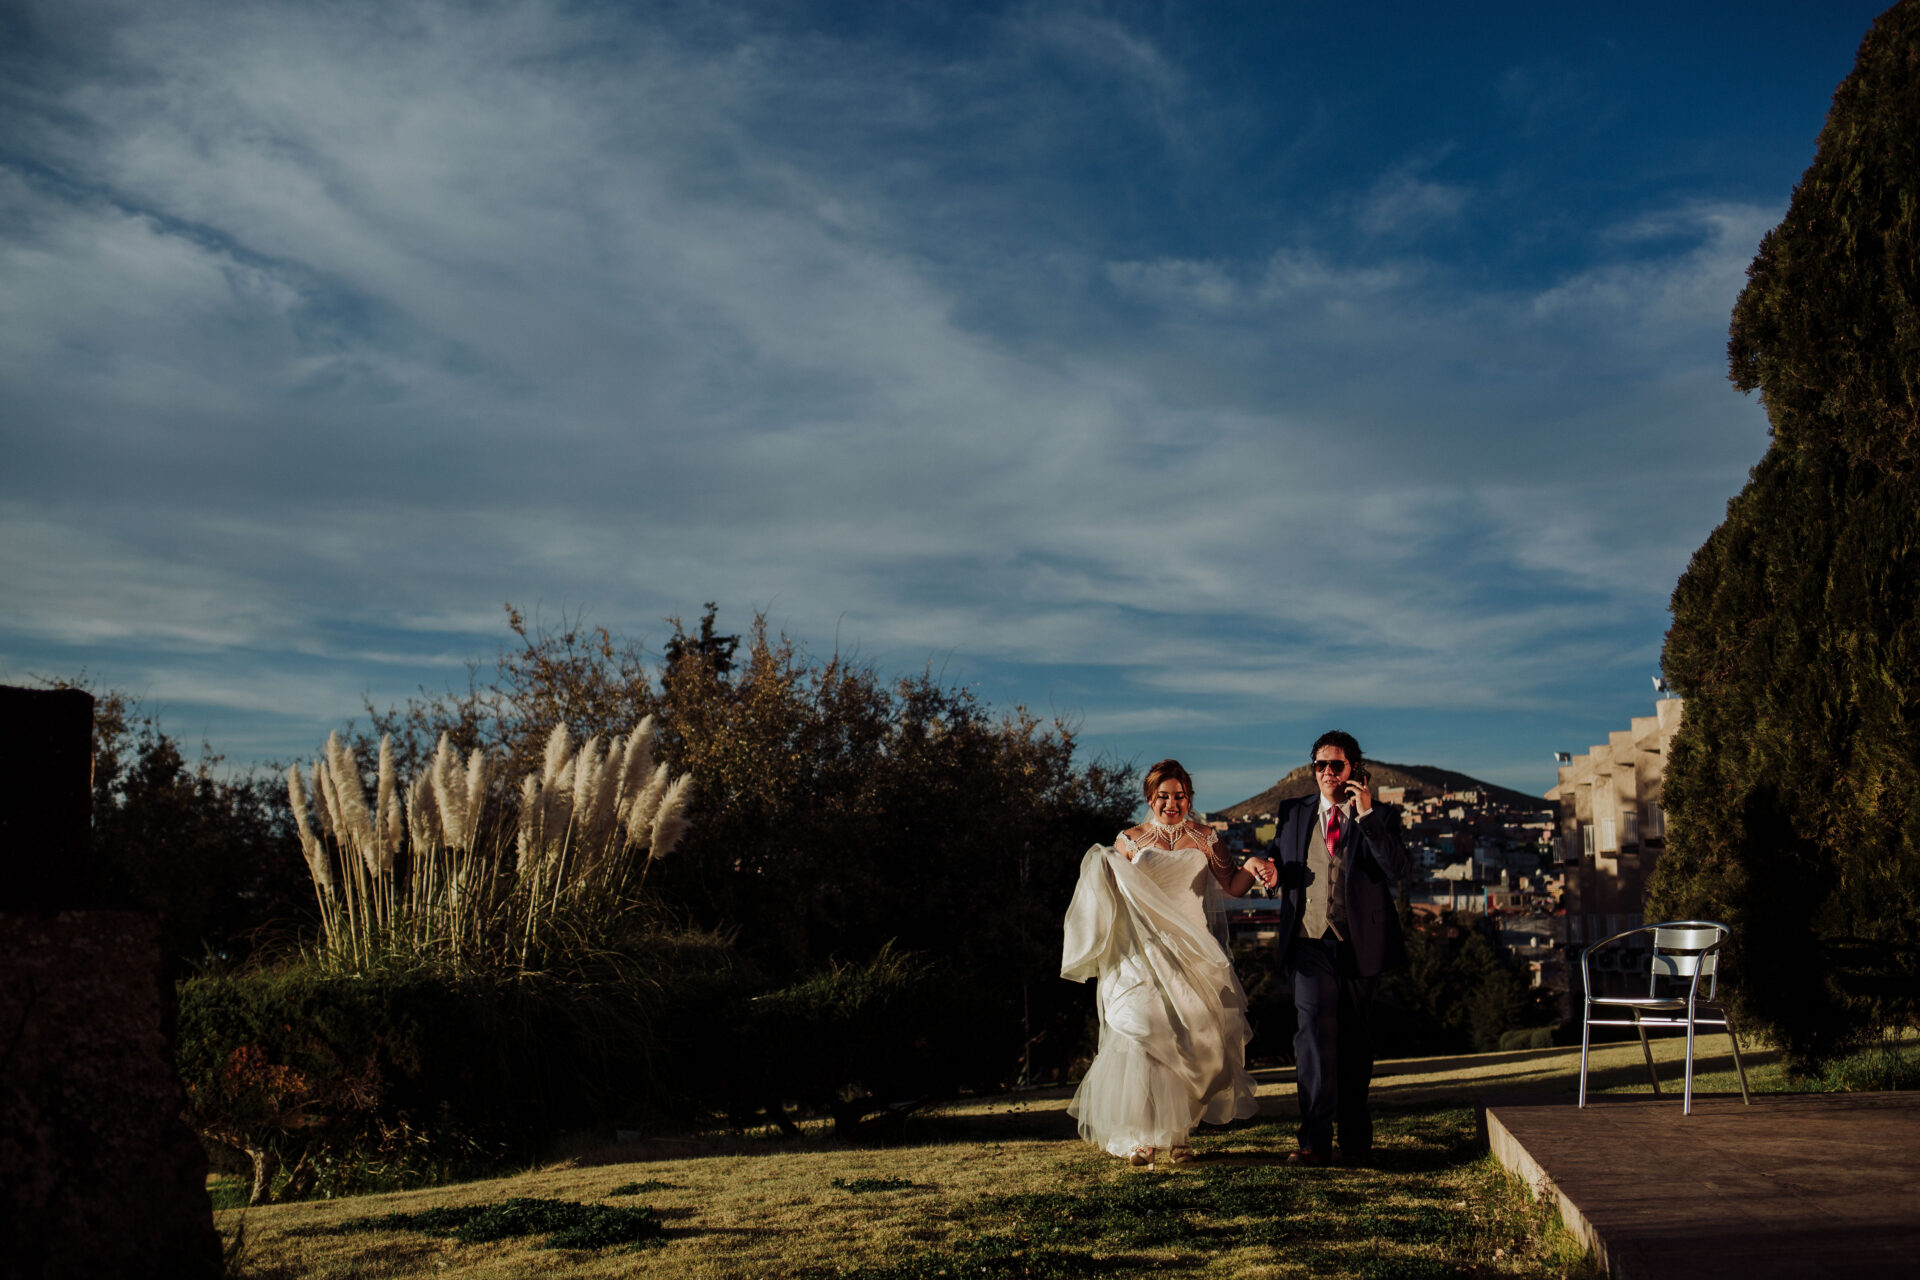 javier_noriega_fotografo_bodas_gaviones_zacatecas_wedding_photographer18